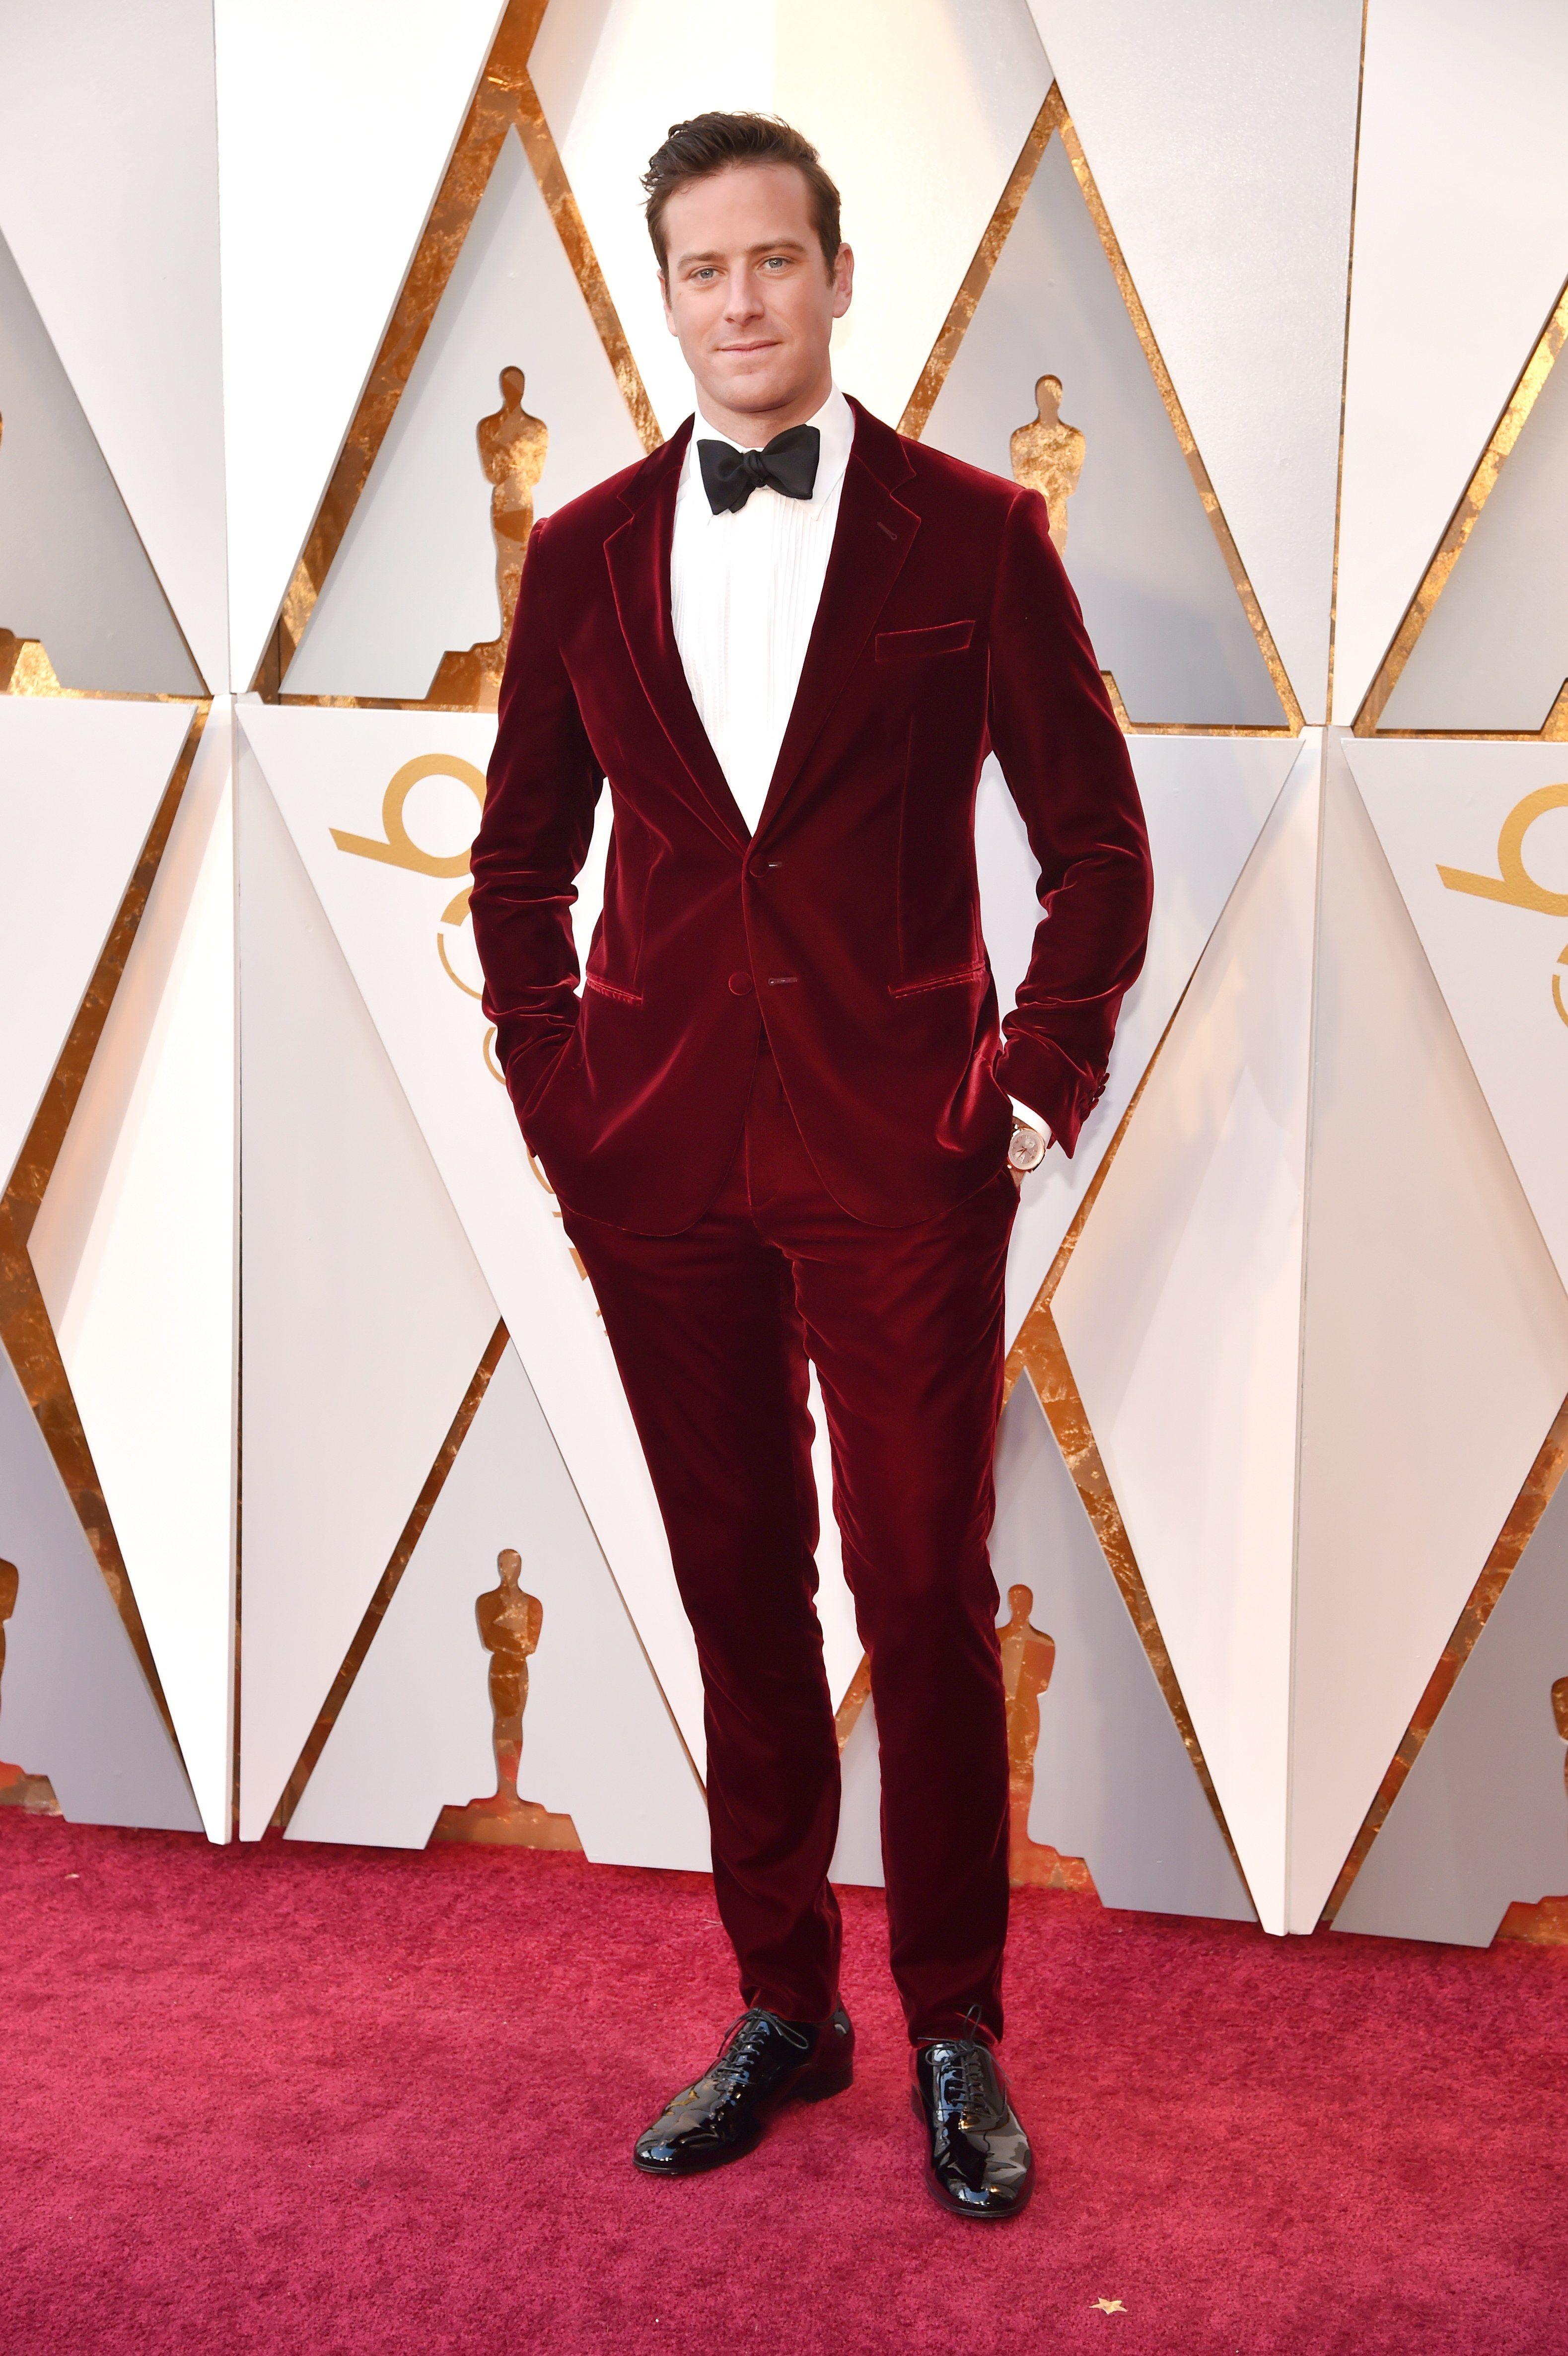 Jacket bomber stunning on the red carpet